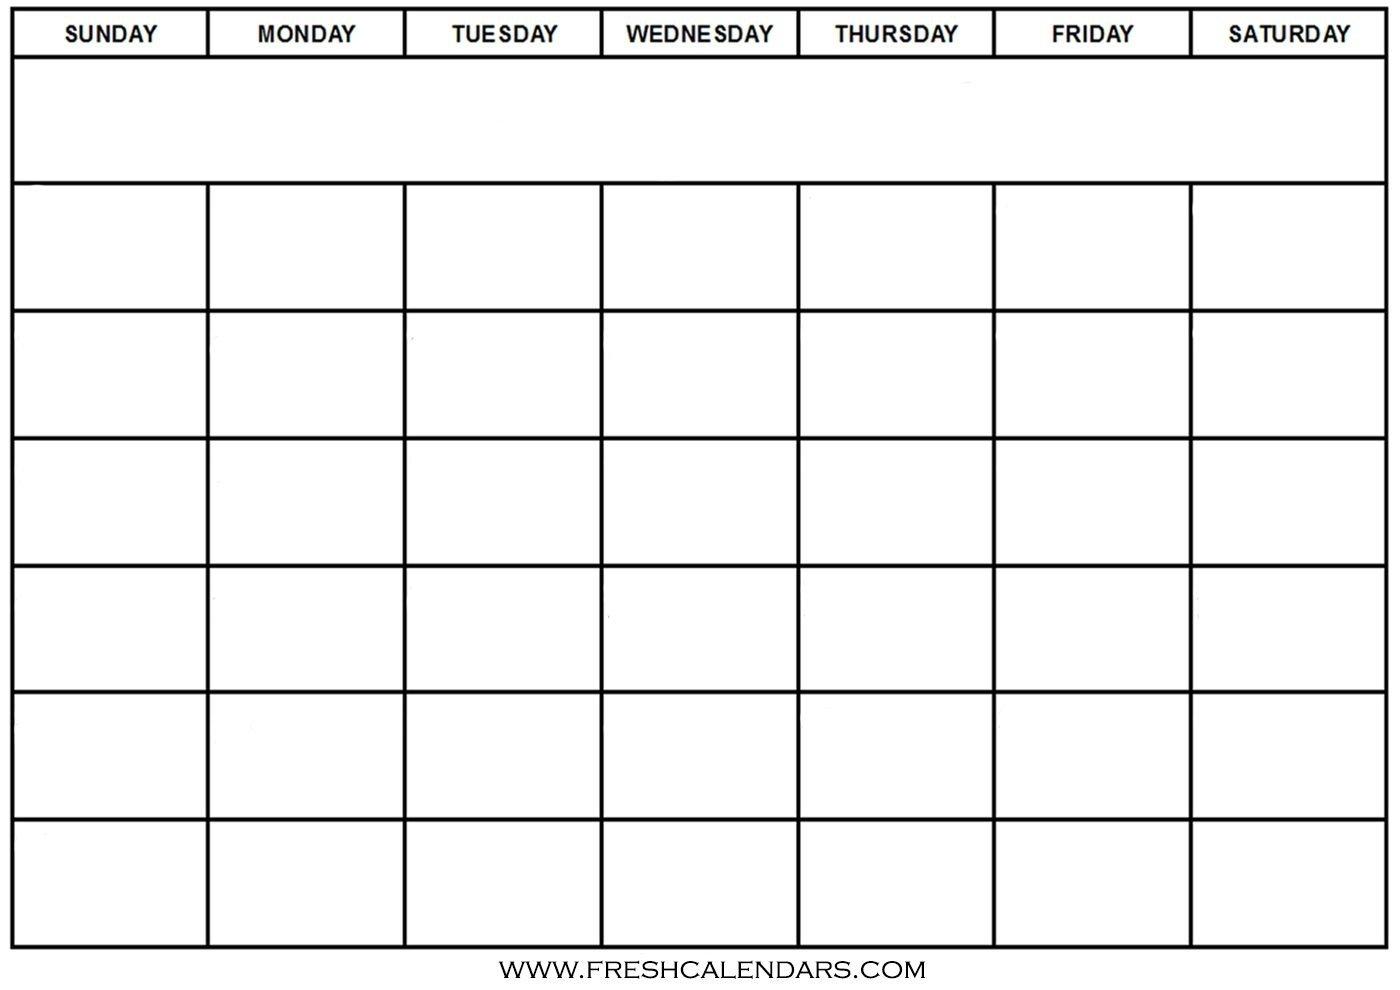 Free Printable Calendar That I Can Edit   Ten Free Free Calendars That I Can Edit And Print